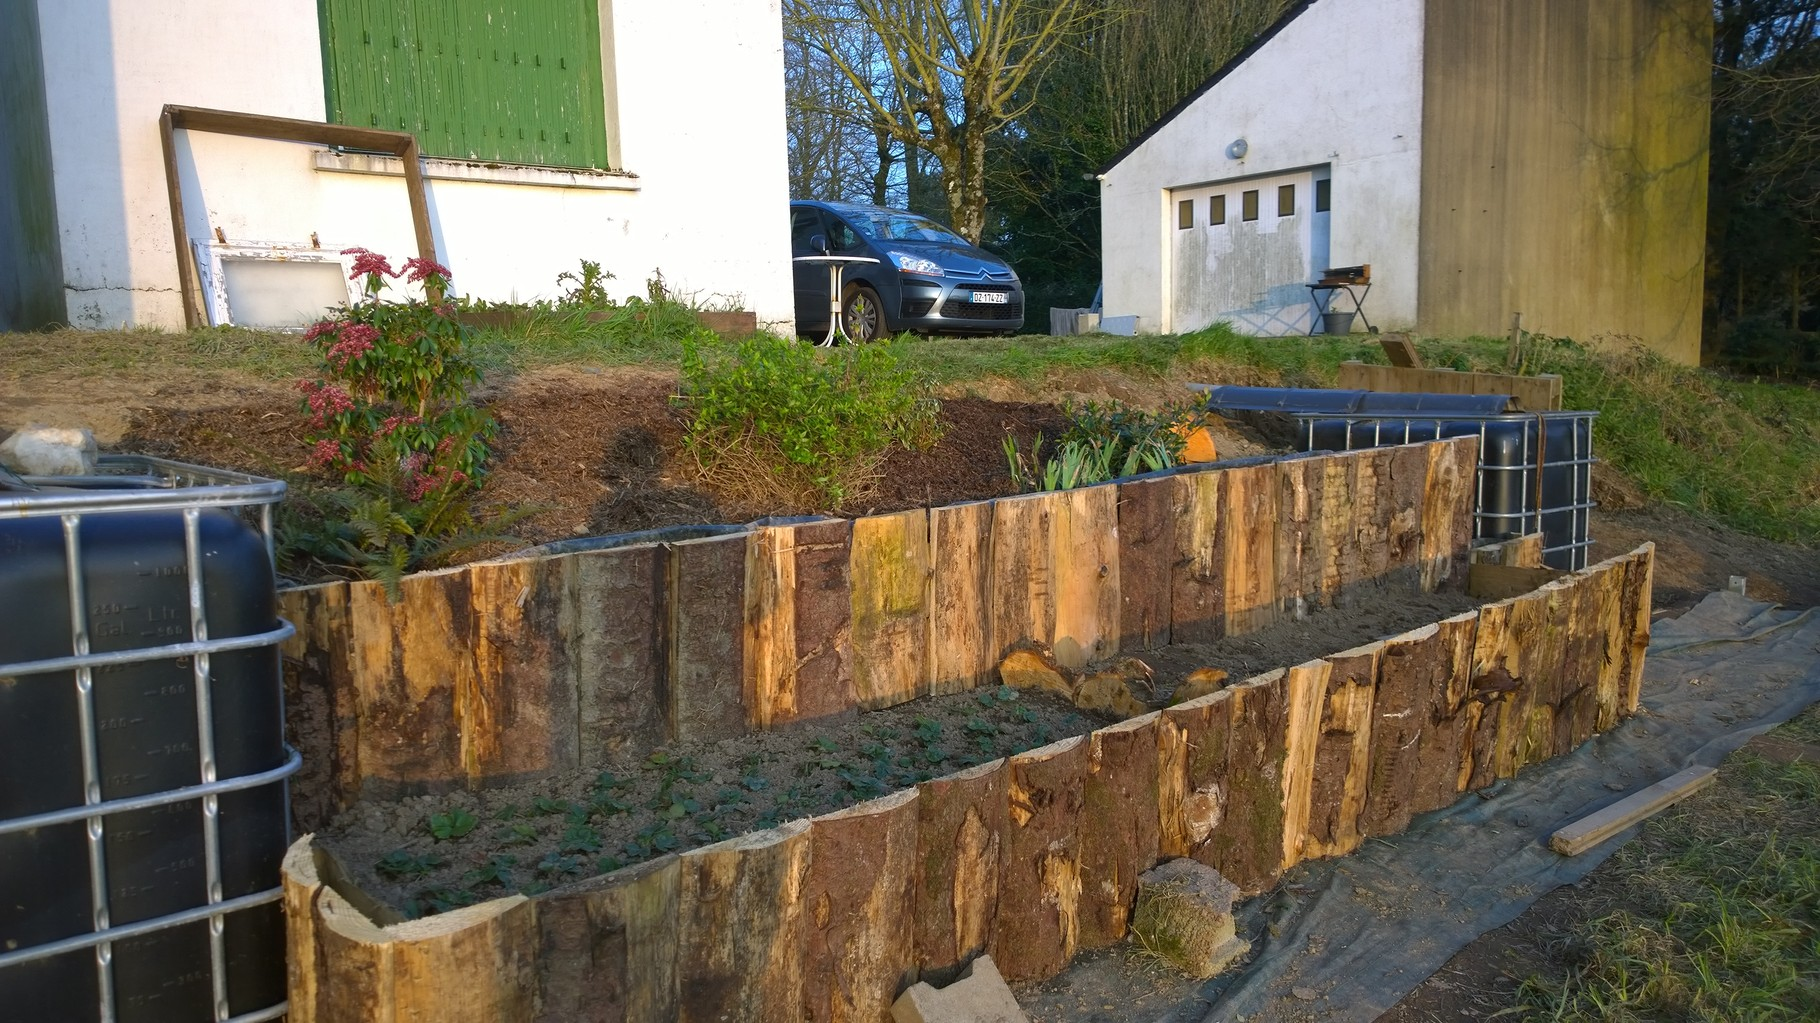 Jardin paysager provence toulon 39 - Ikea zaragoza jardin toulon ...